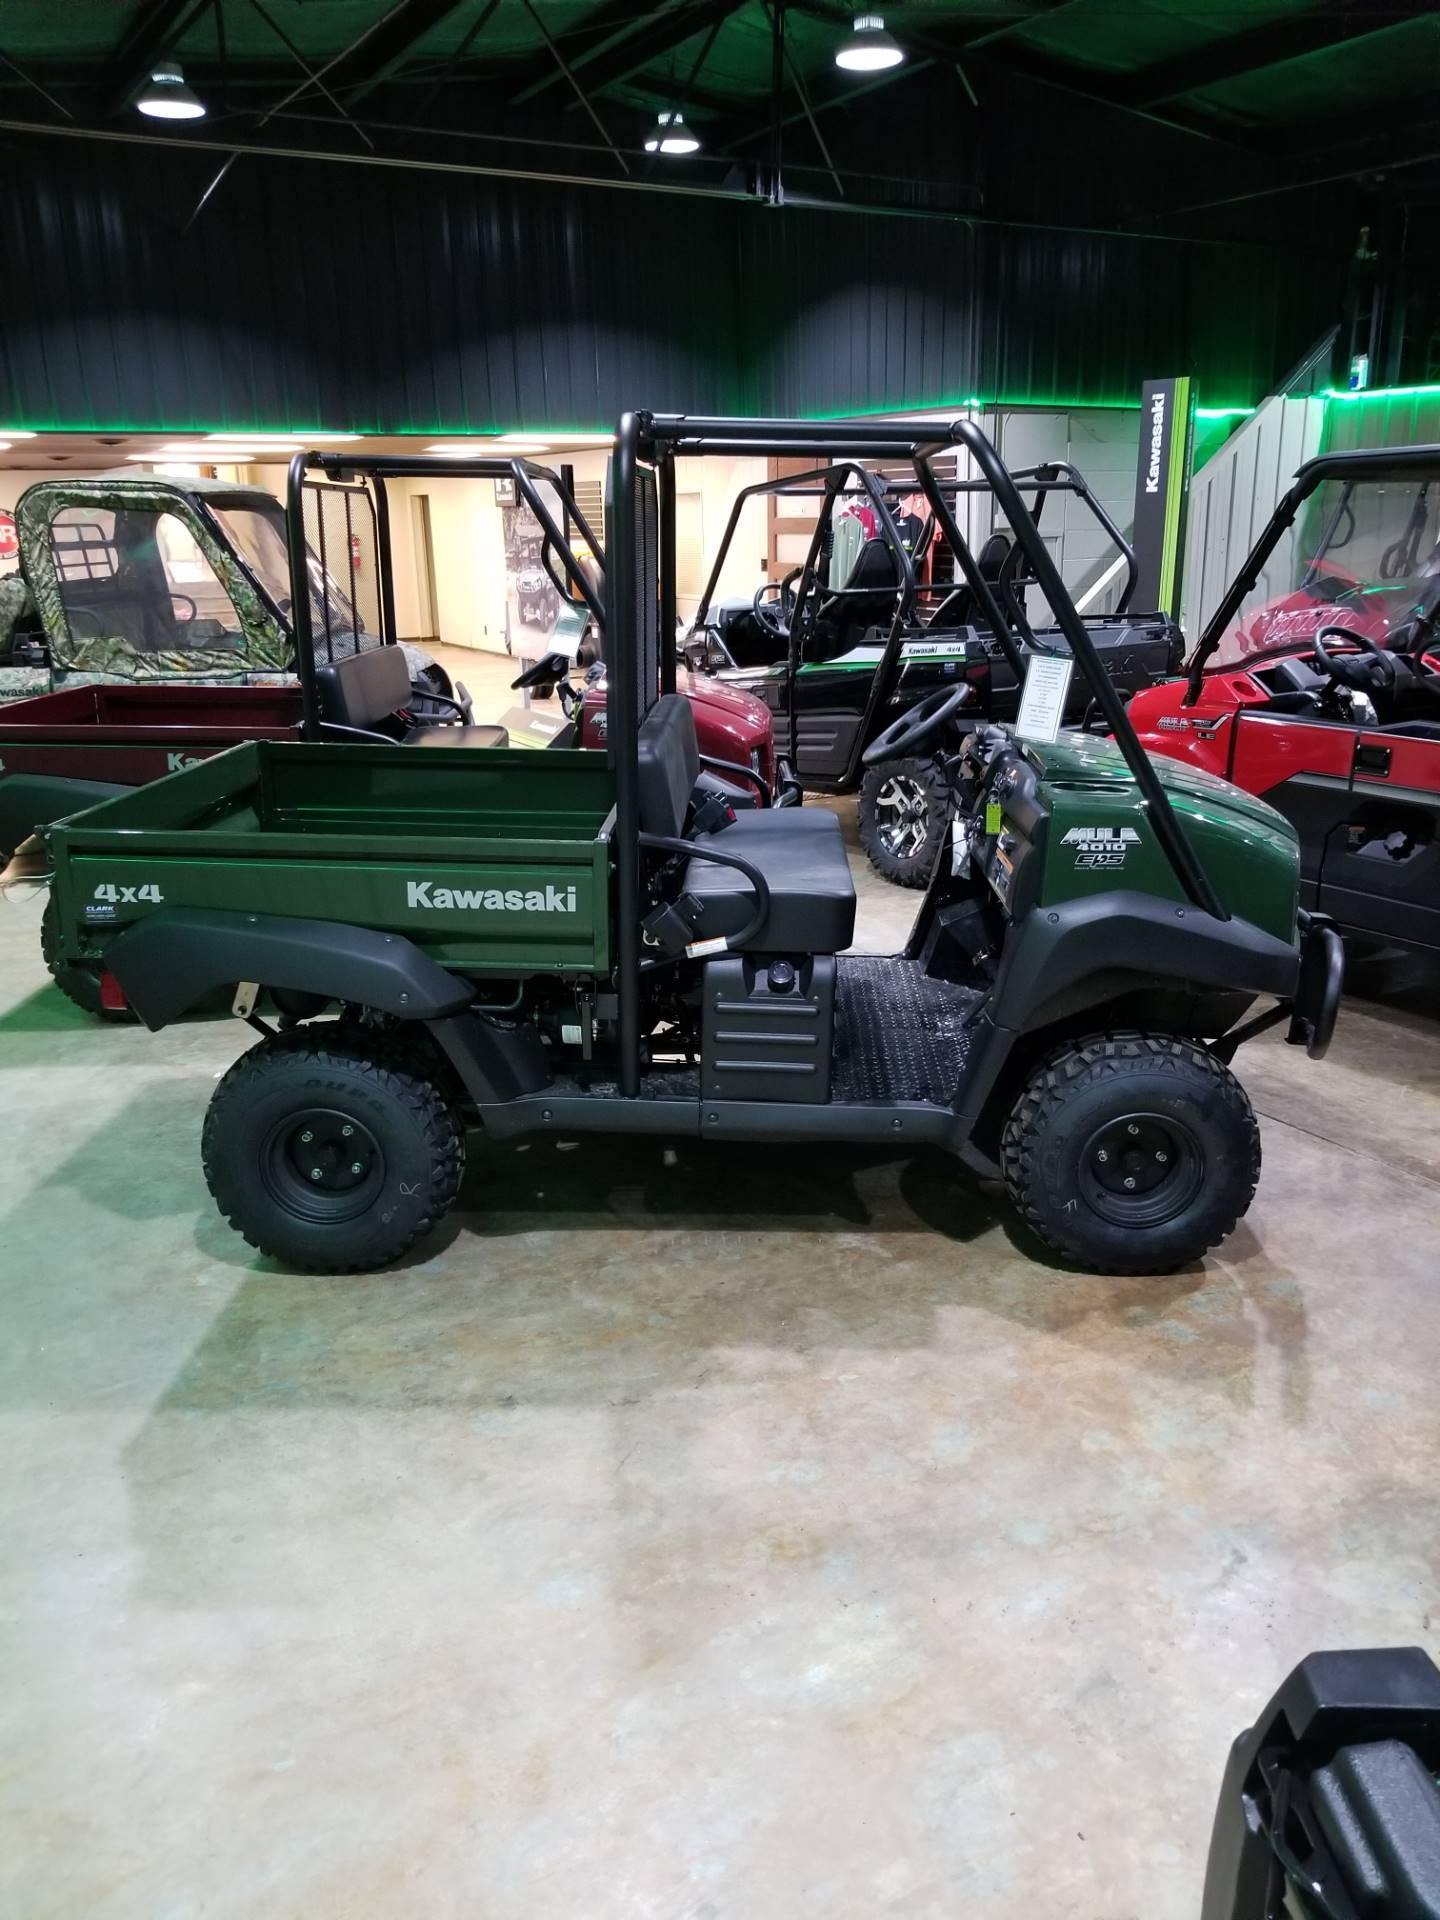 2019 Kawasaki Mule 4010 4x4 for sale 29141